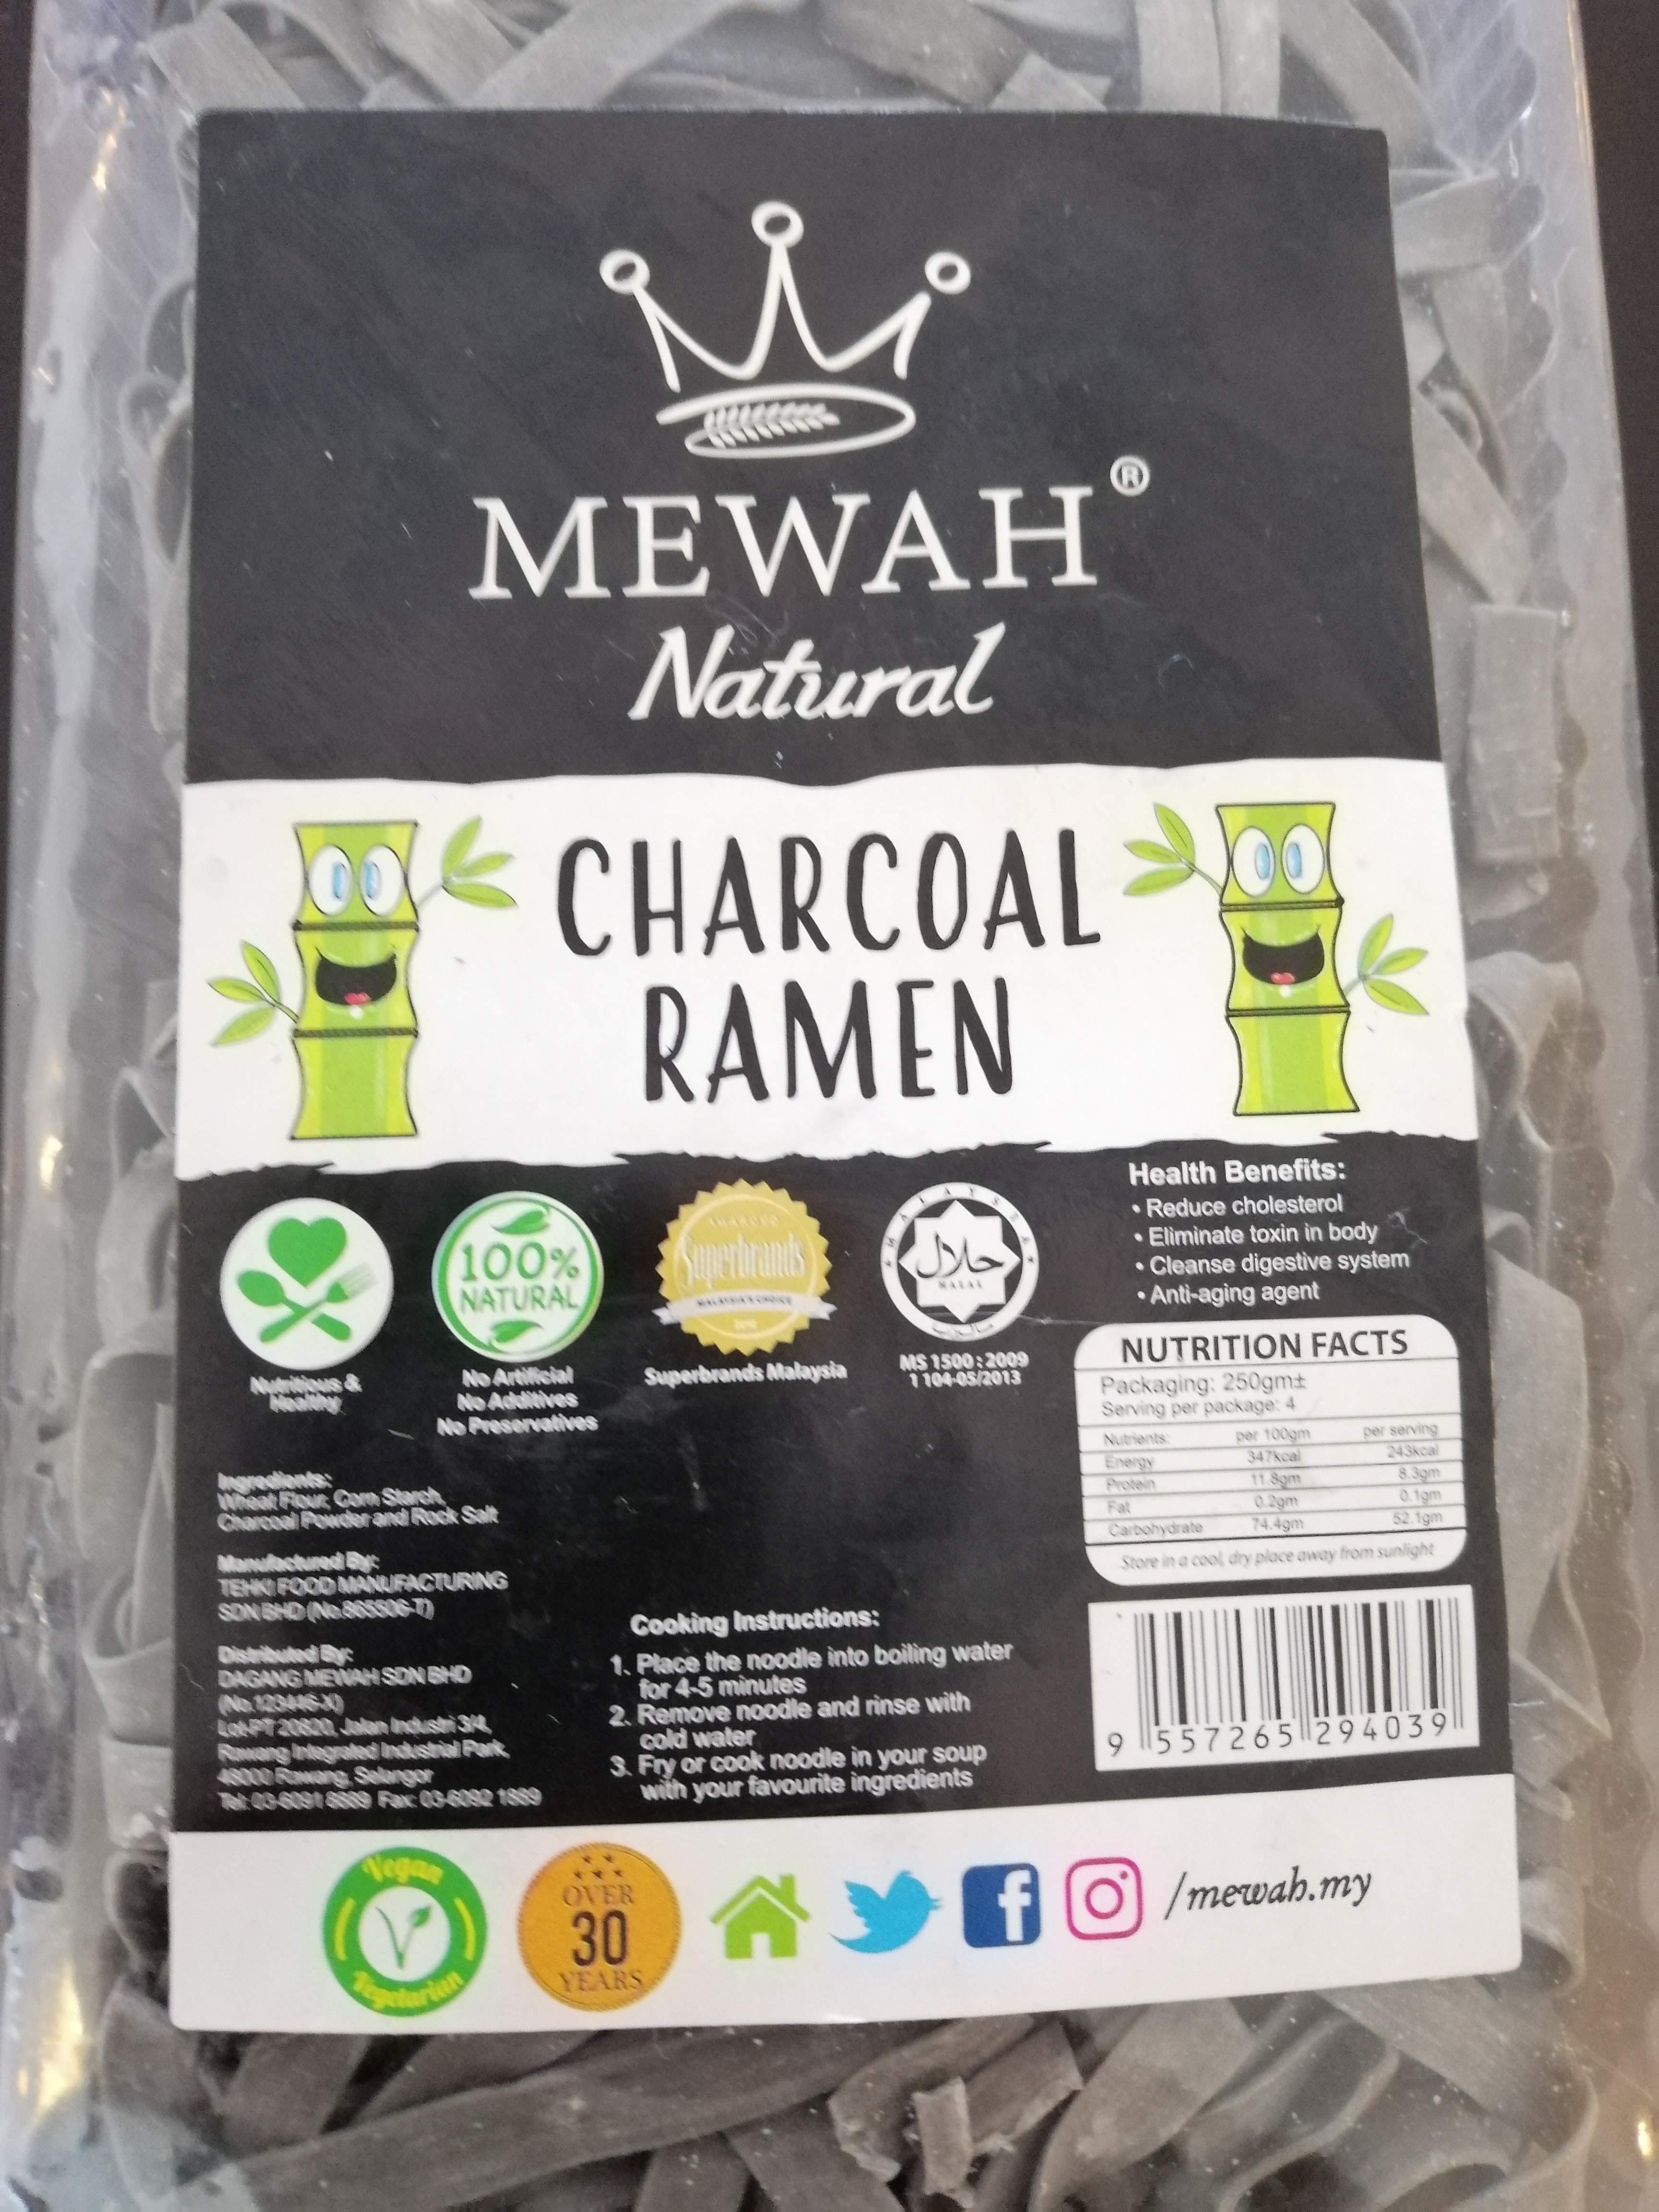 Charcoal ramen